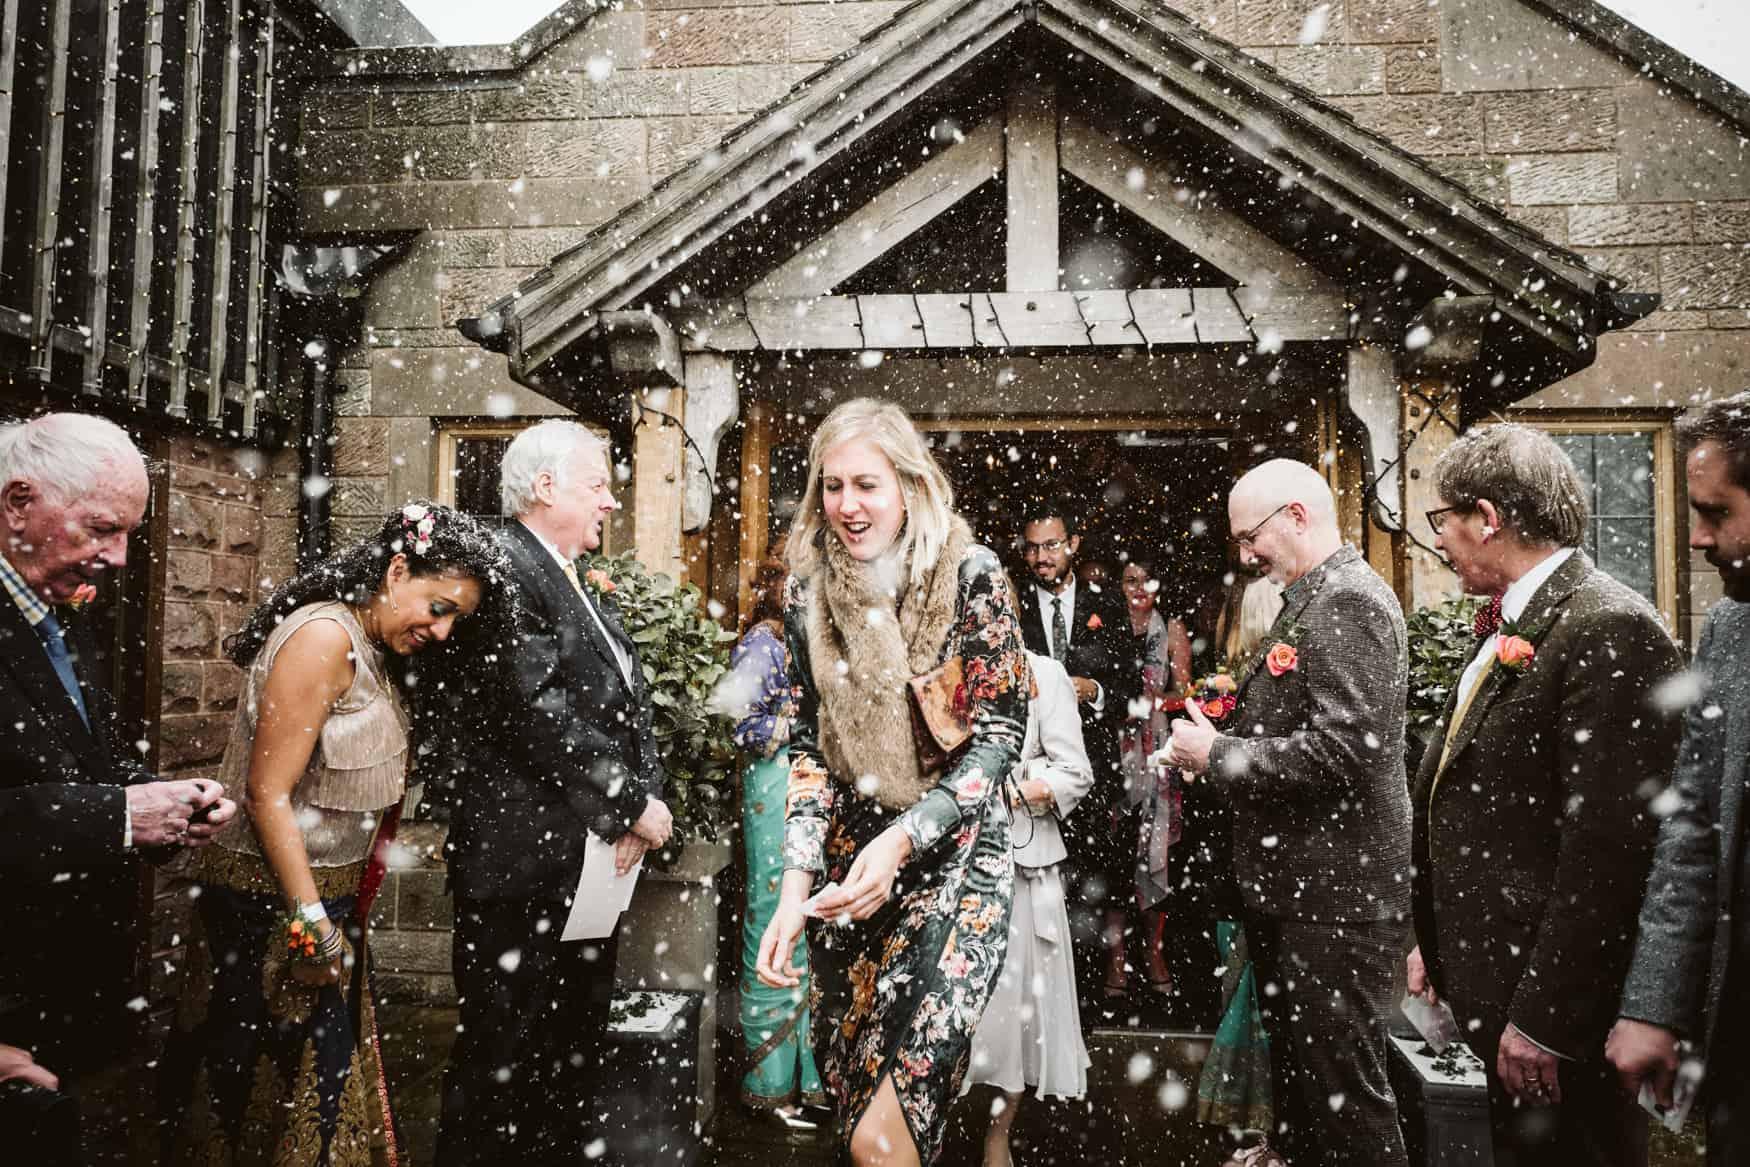 Blizzard outside Heaton House Farm wedding venue